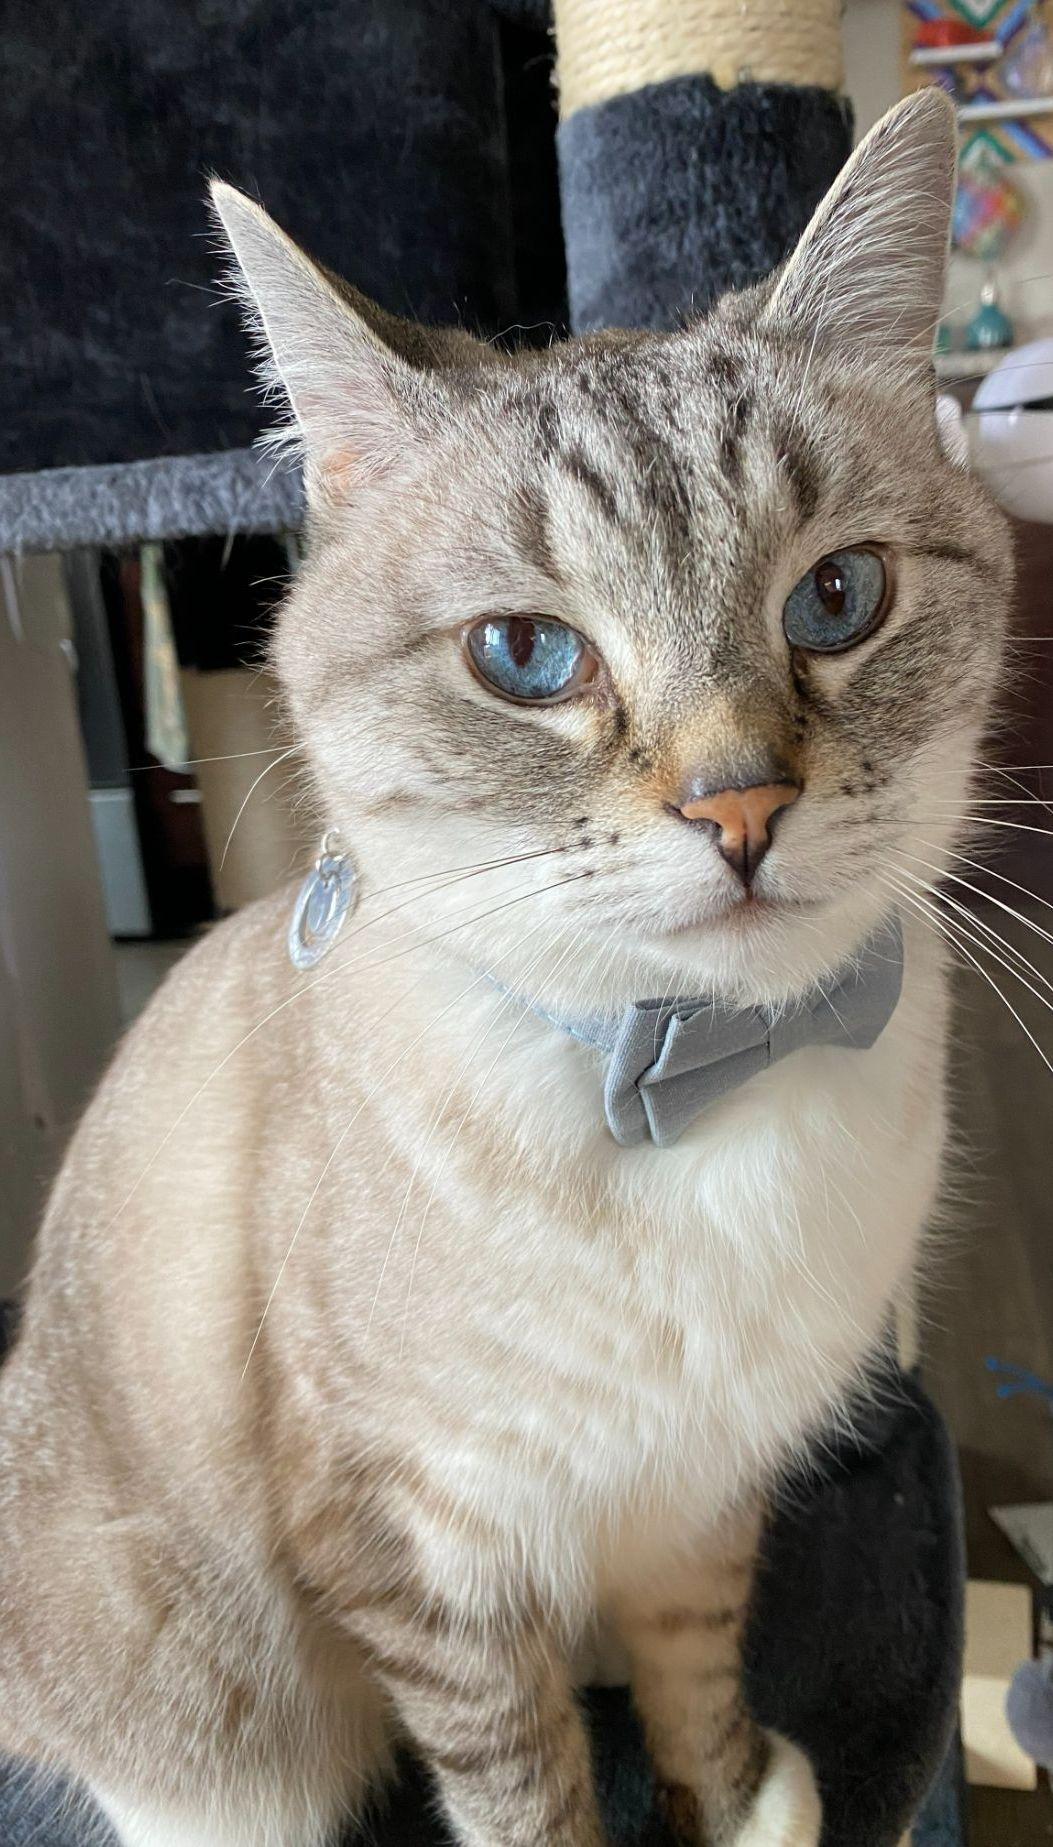 Cat wearing a bow tie